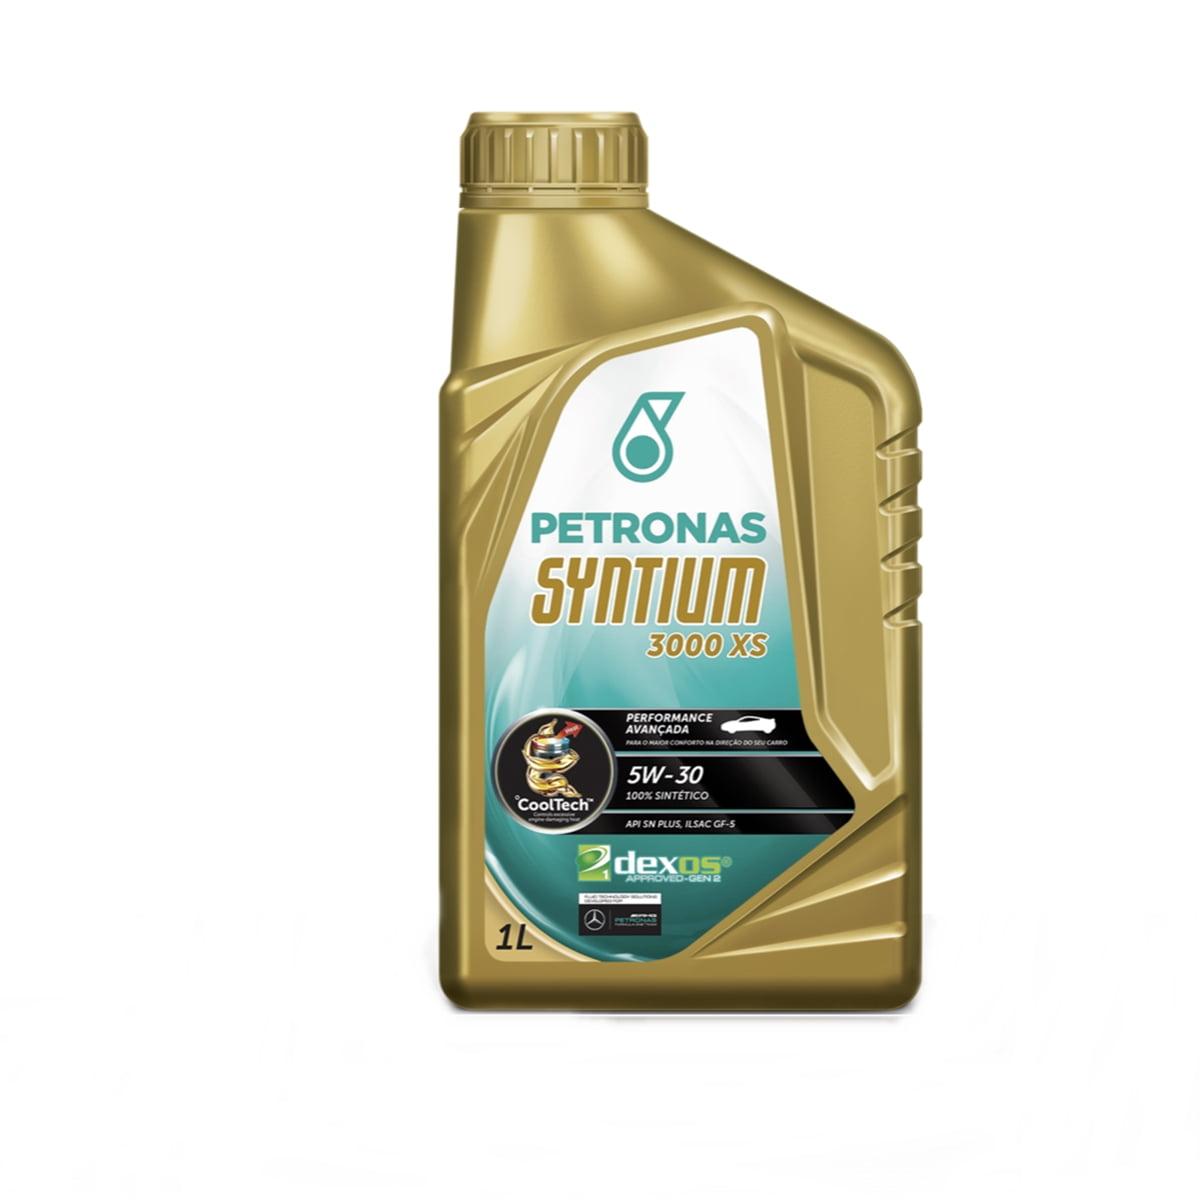 Oleo De Motor 5w30 Petronas Syntium 3000 Xs Sintético 1lt